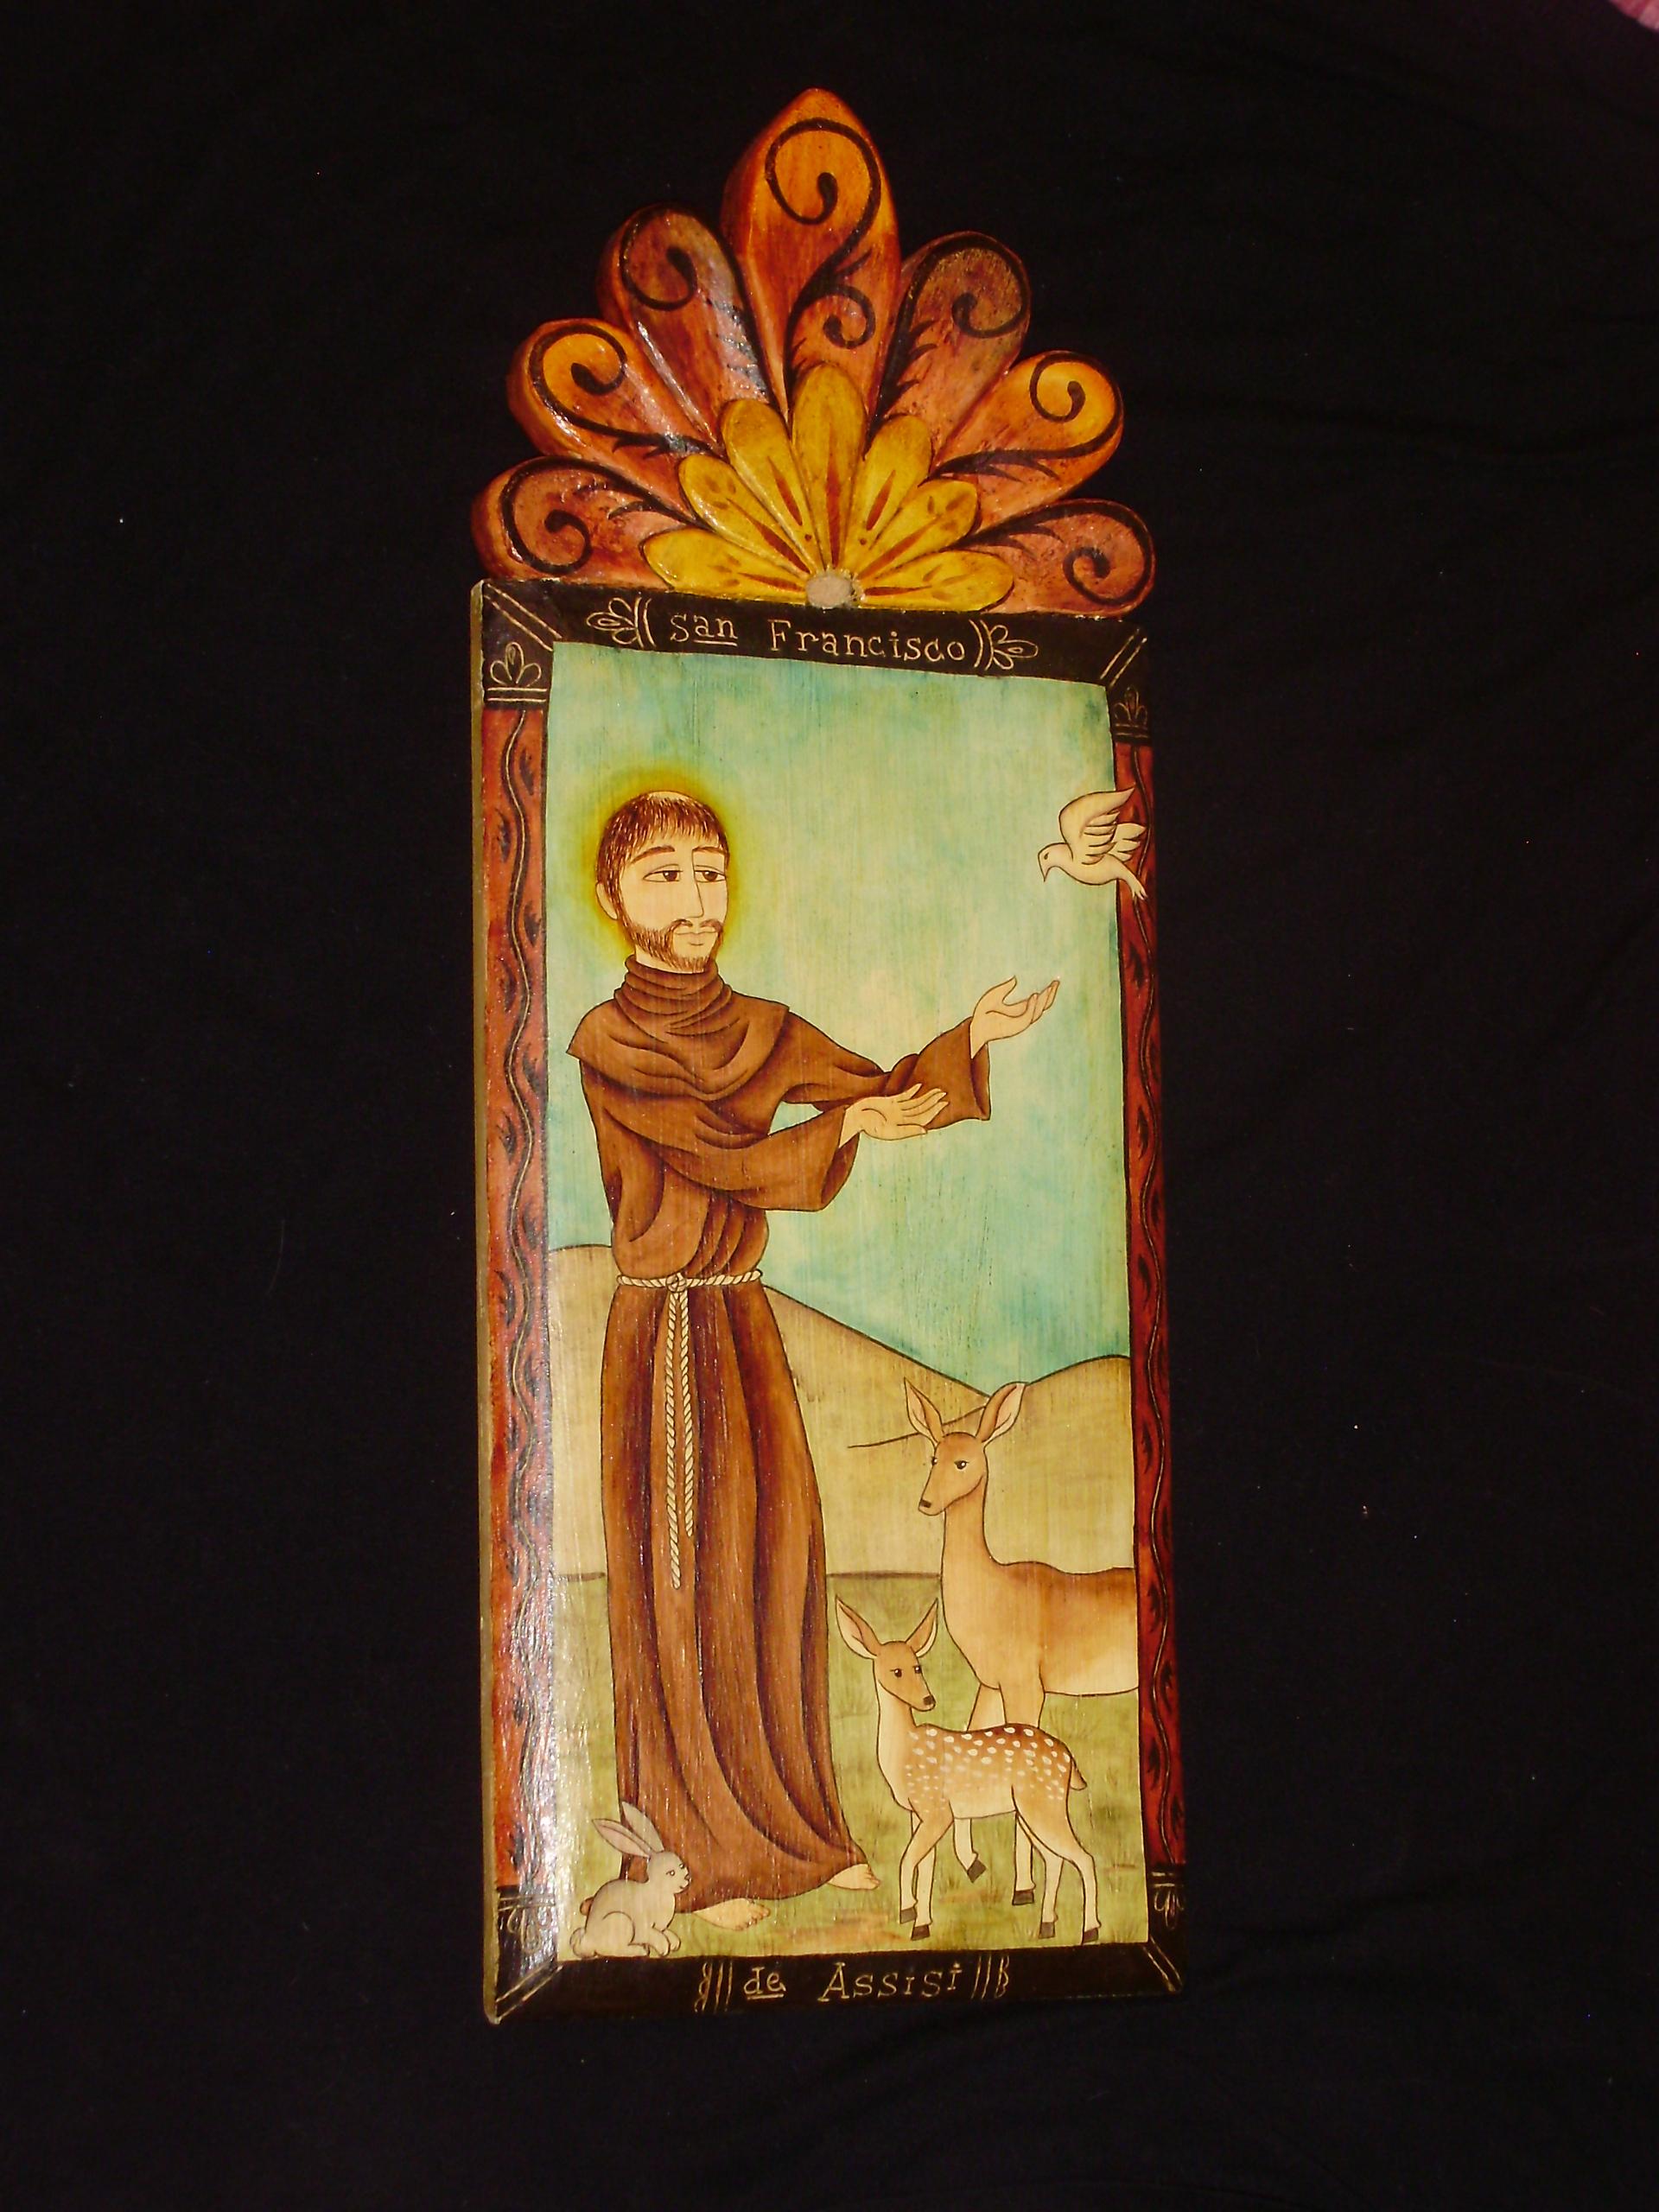 San fransisco virgin